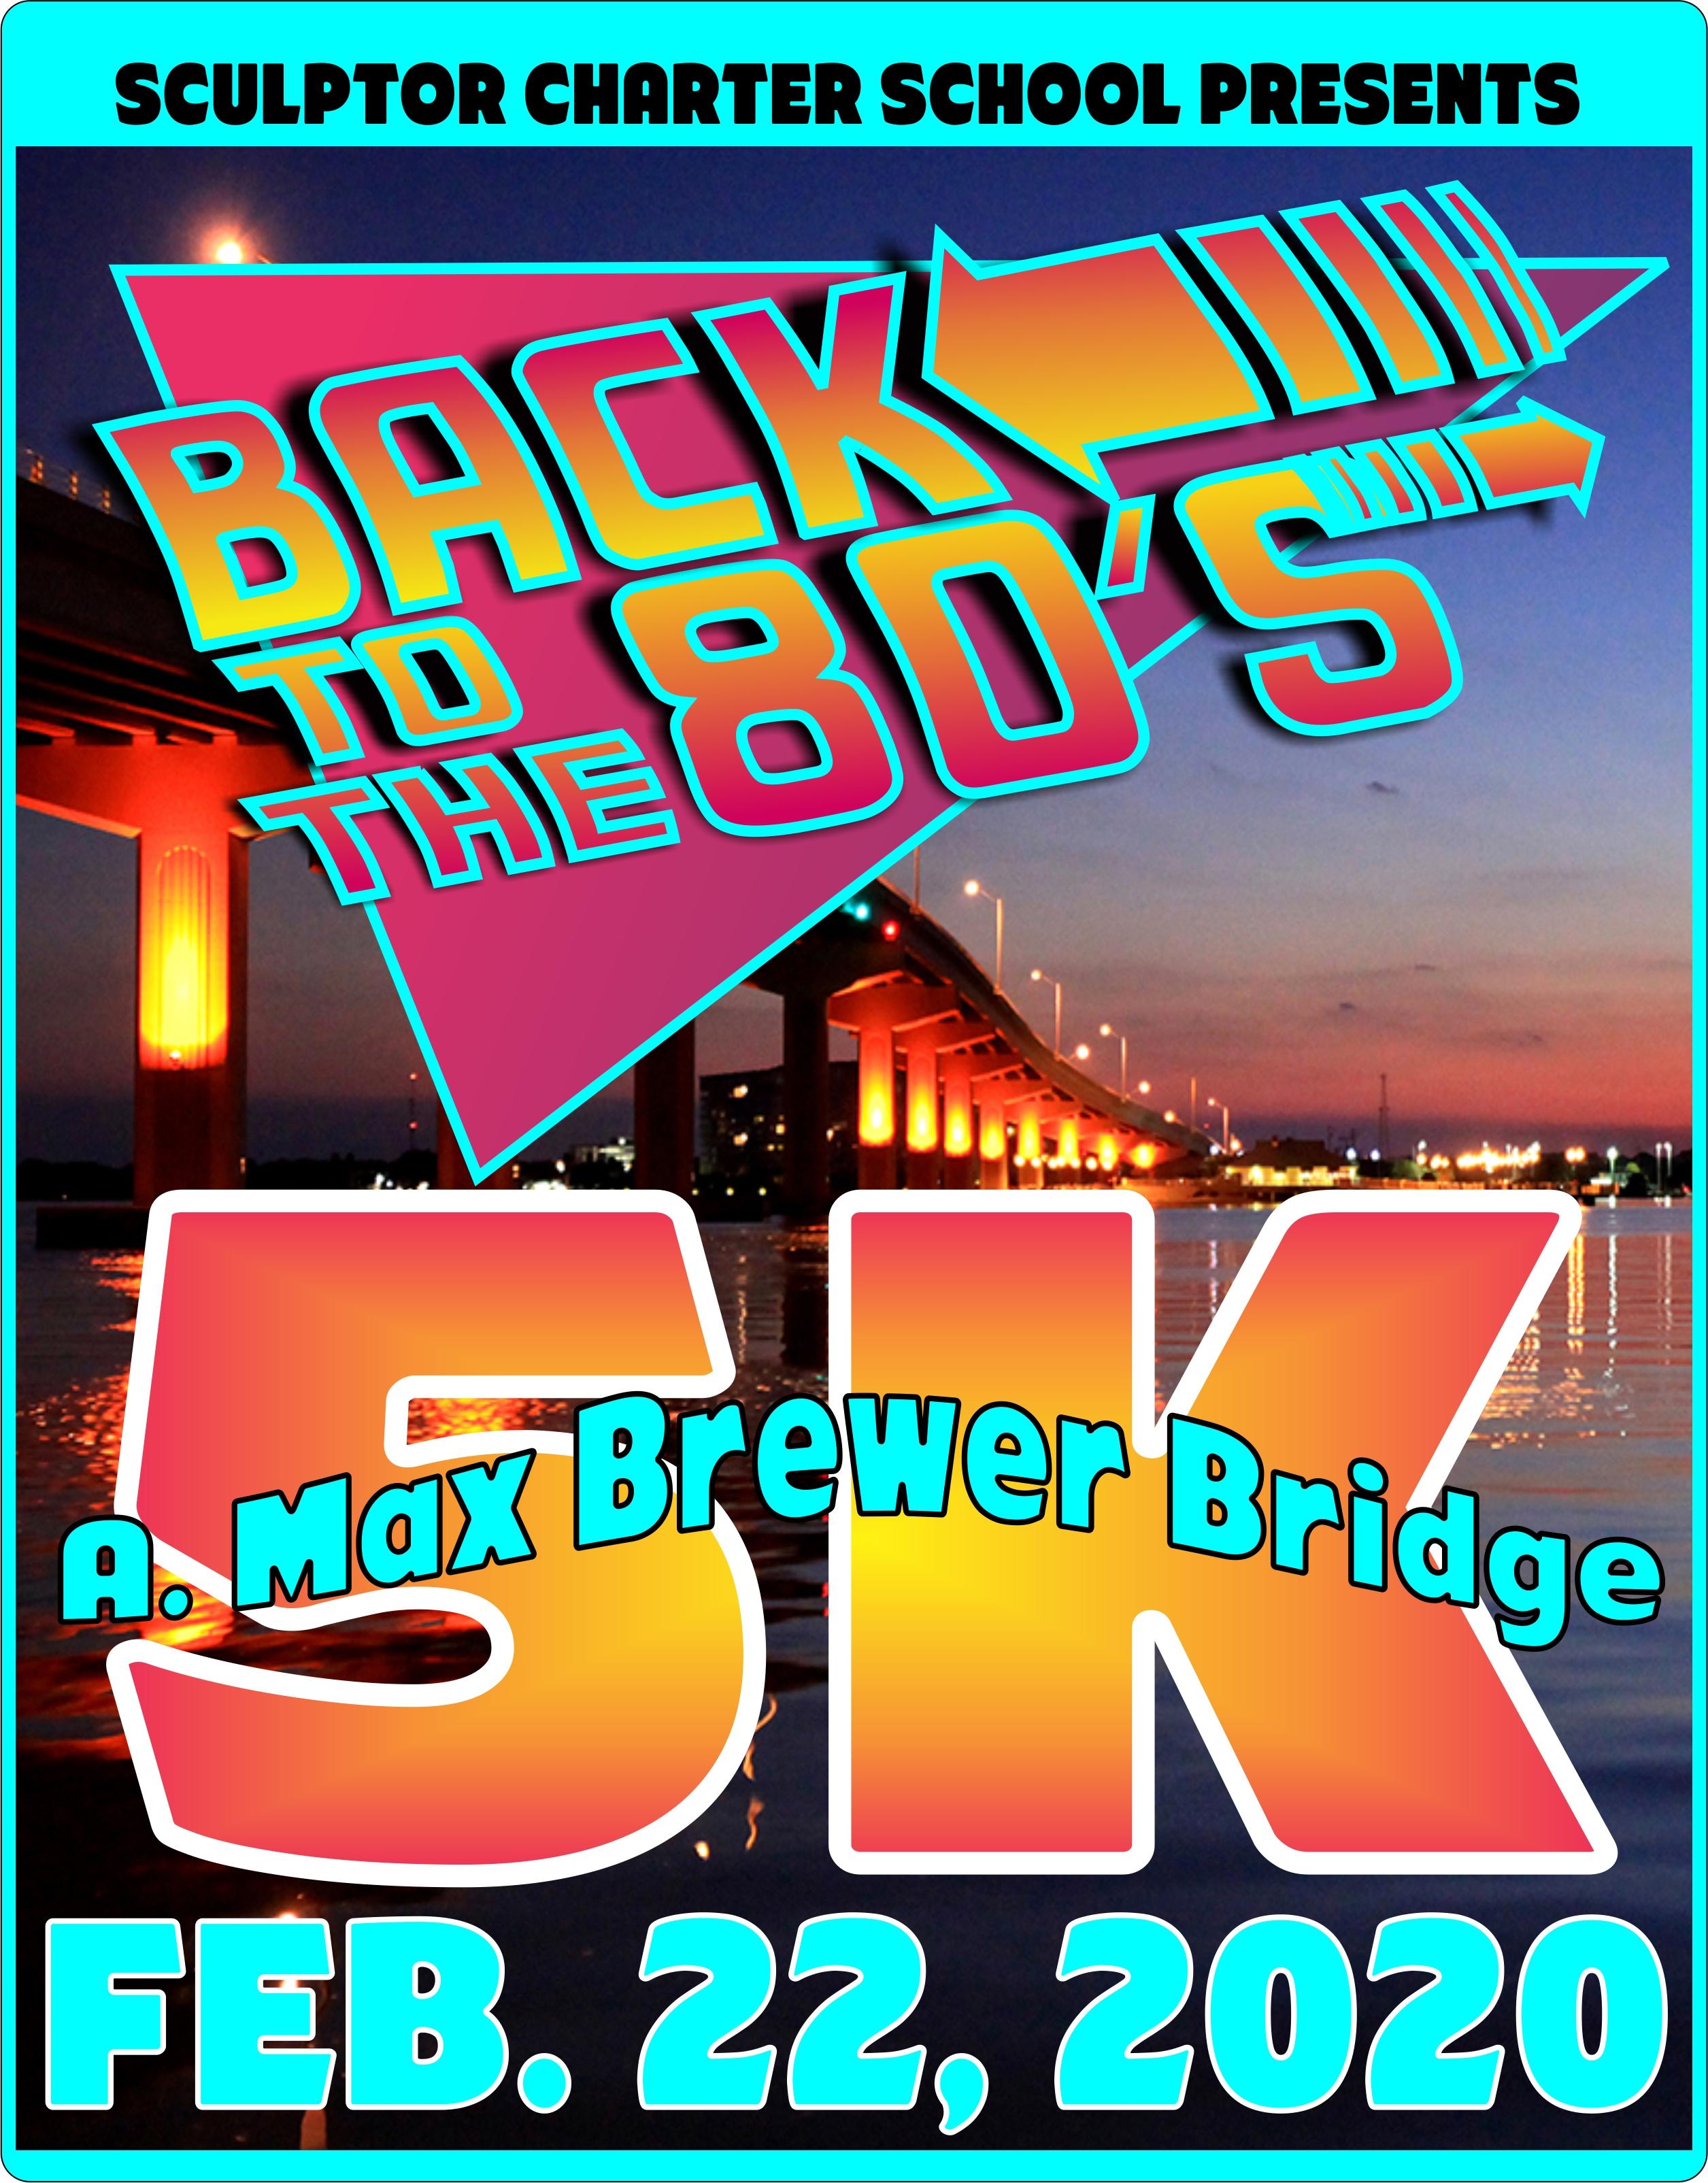 Sand Point Park/A. Max Brewer Bridge